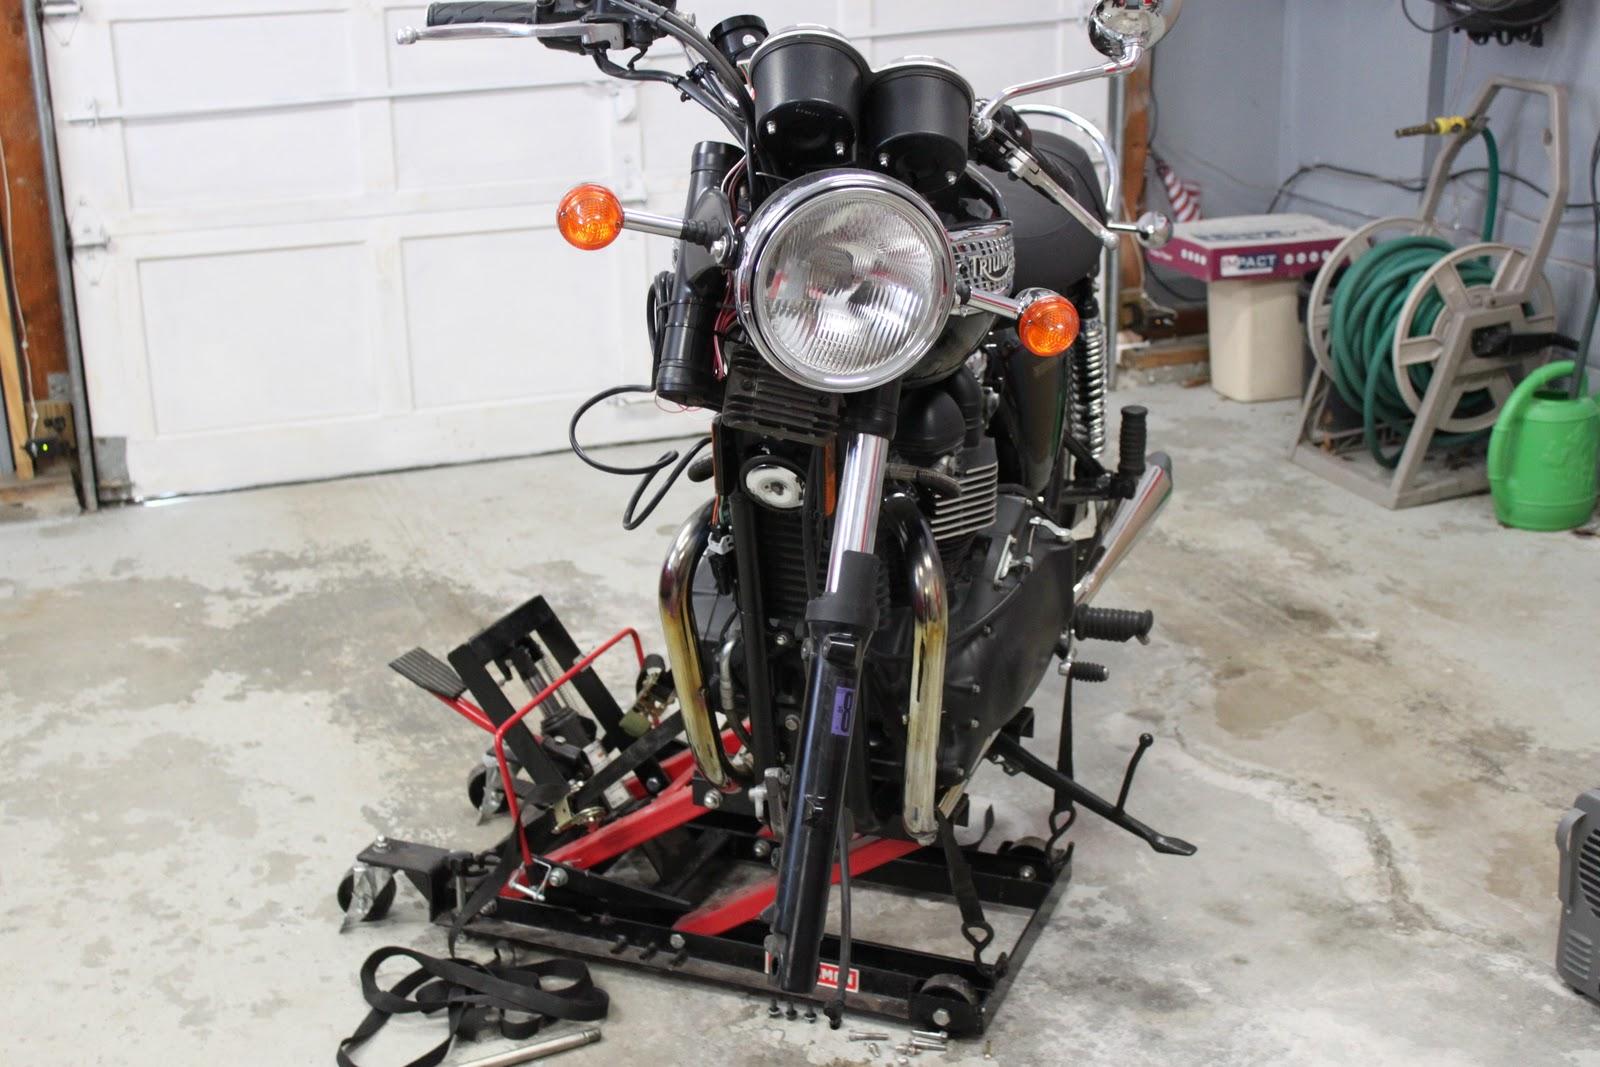 Adam's Motorcycle Shop: February 2011